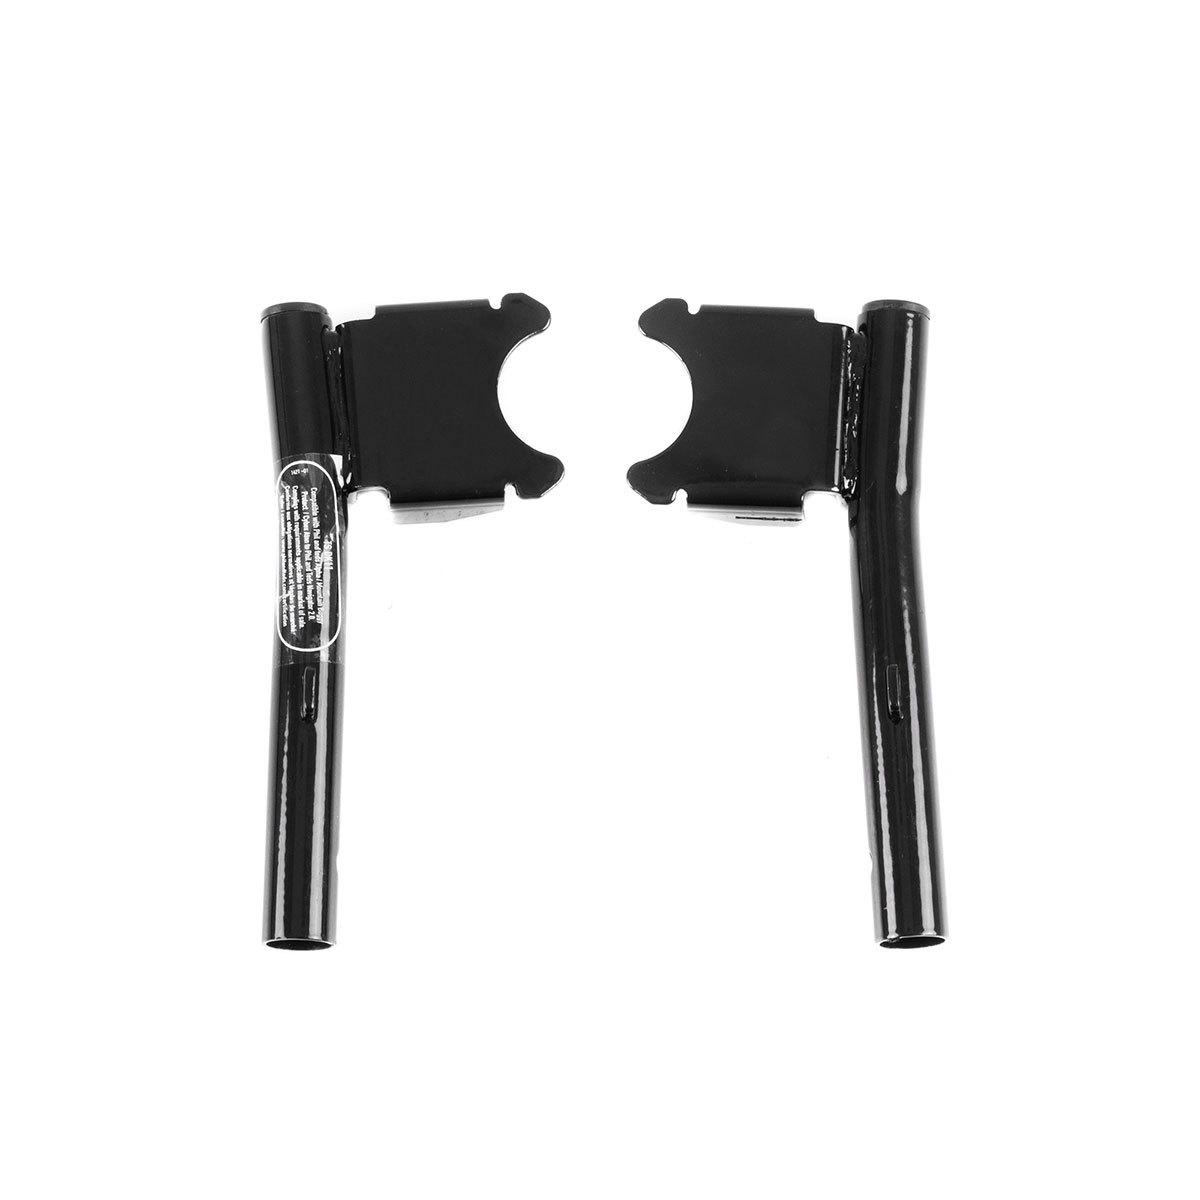 phil&teds car seat adapterDot,sport(2015年モデル)専用フィルアンドテッズカーシートアダプター TSDK11